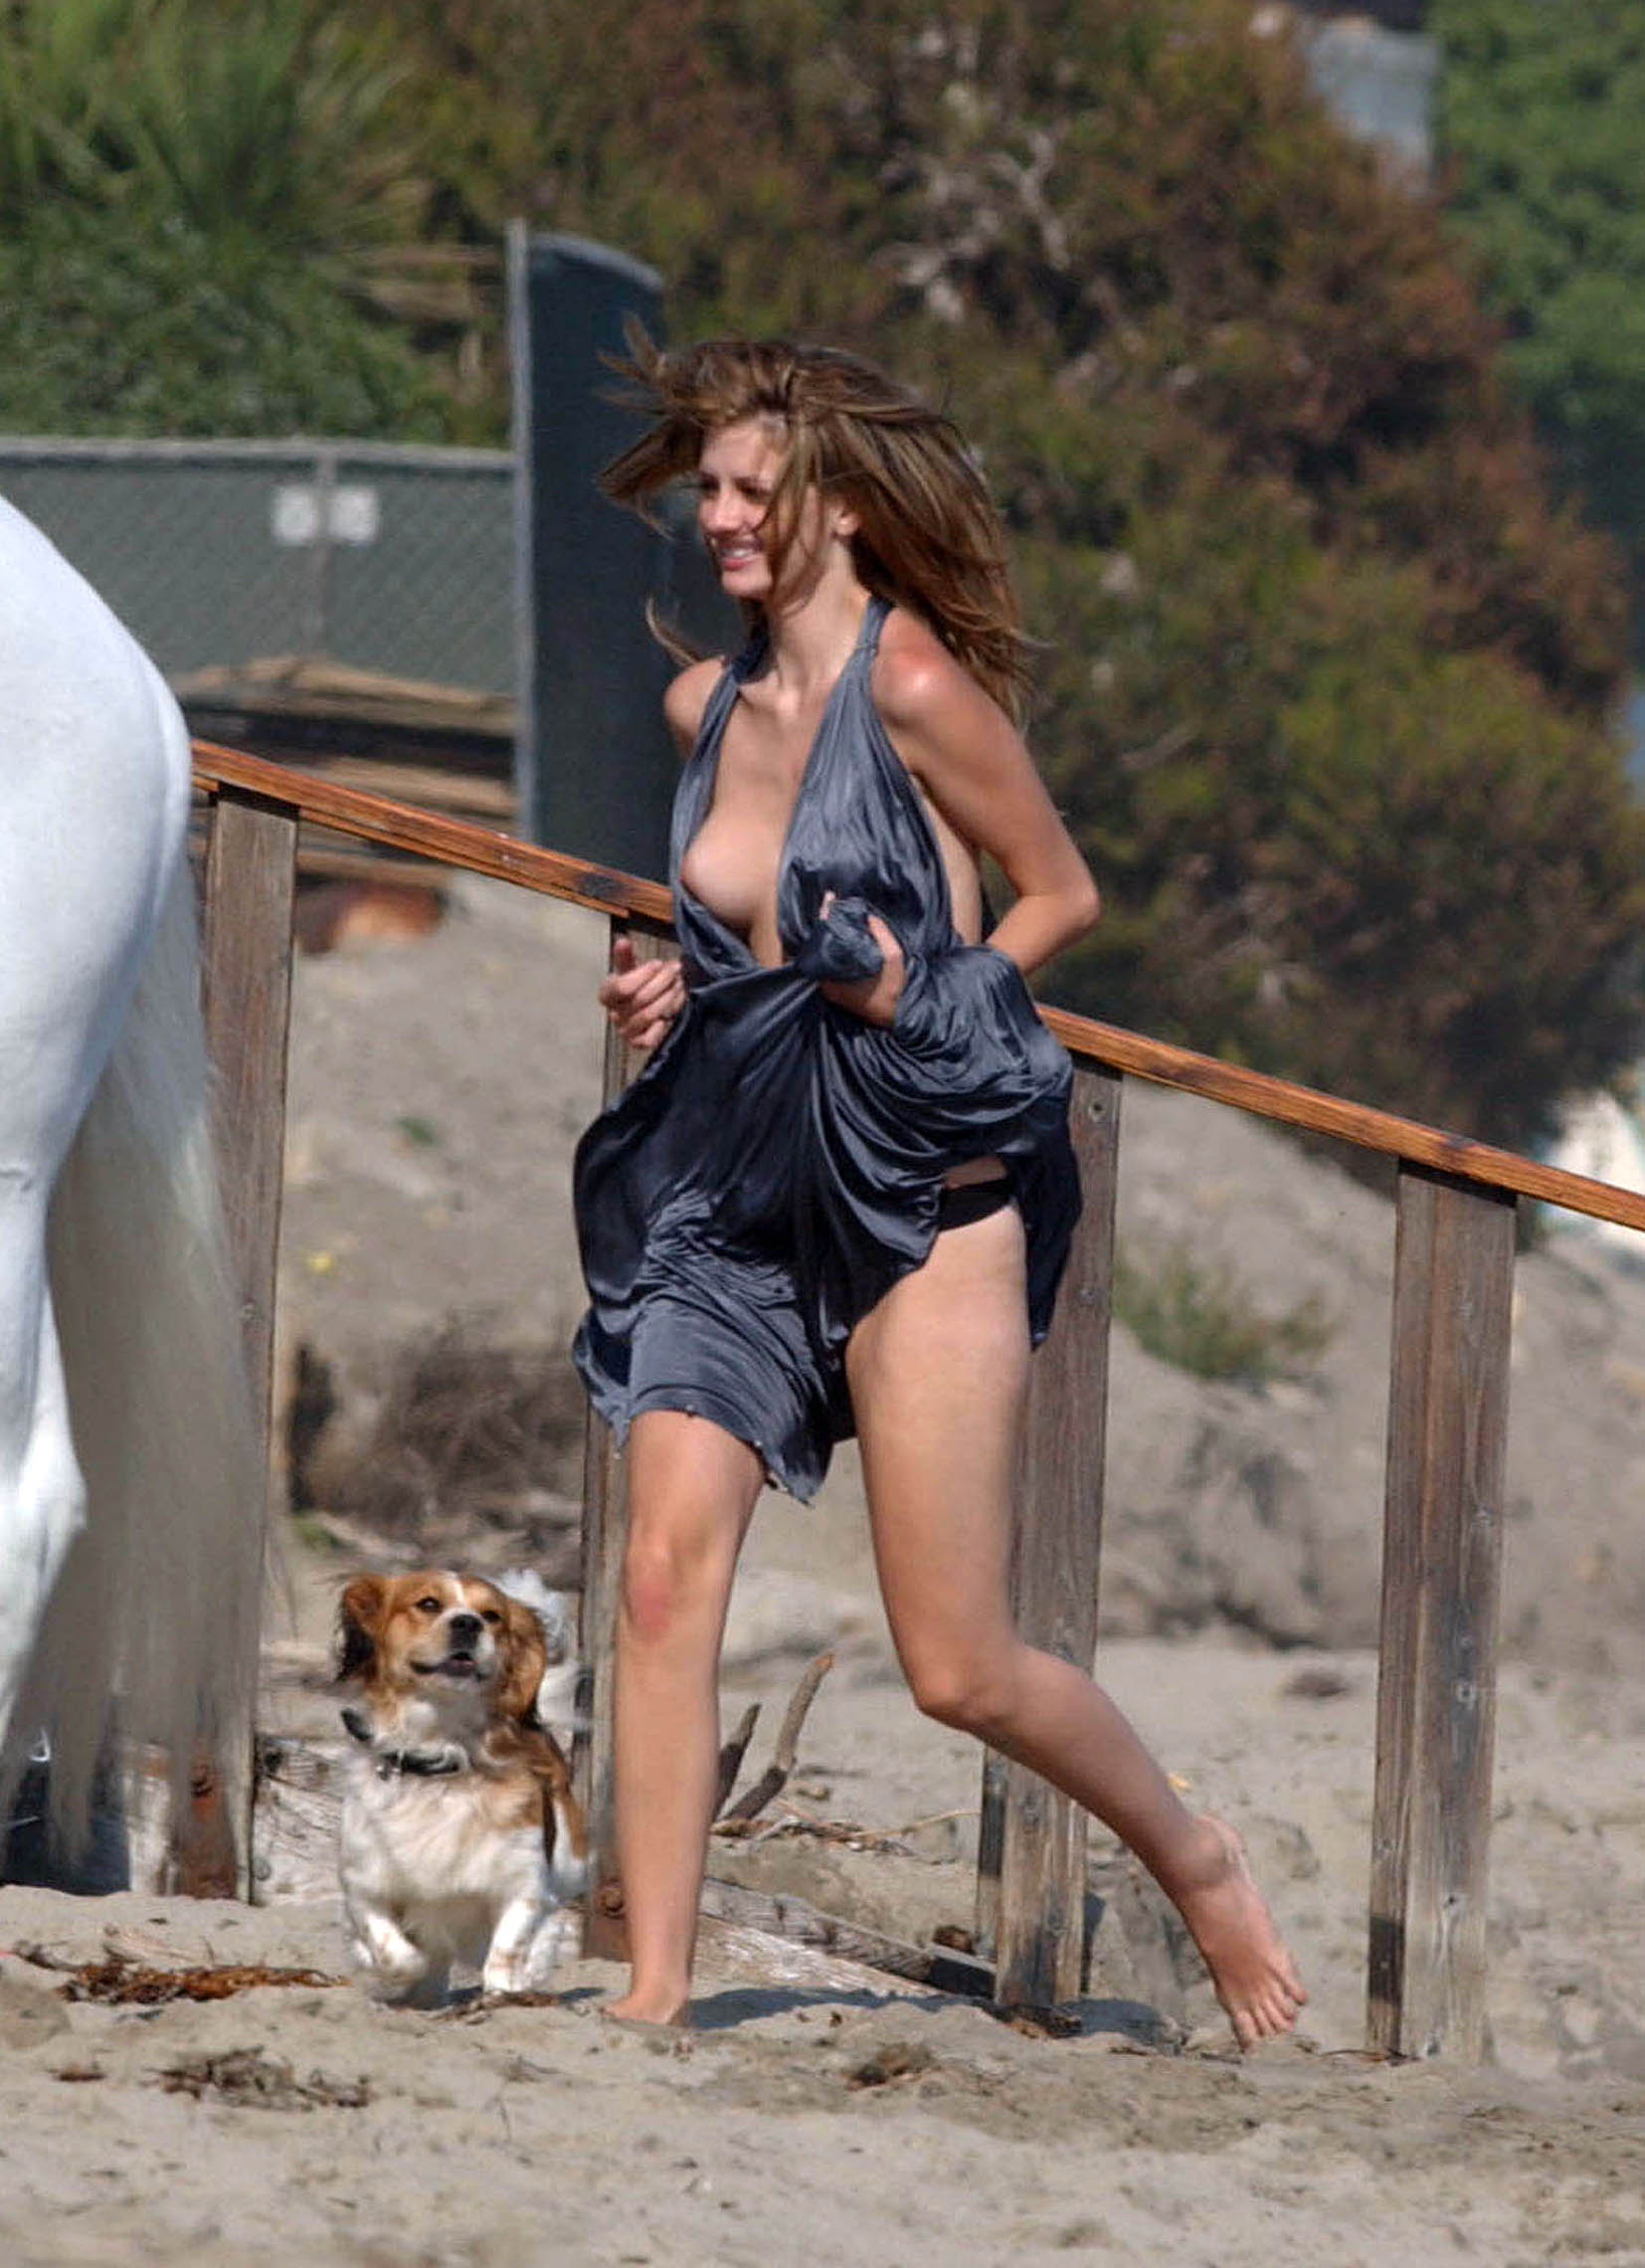 Angela Magana Uncensored mischa barton experiencing an embarrassing wardrobe